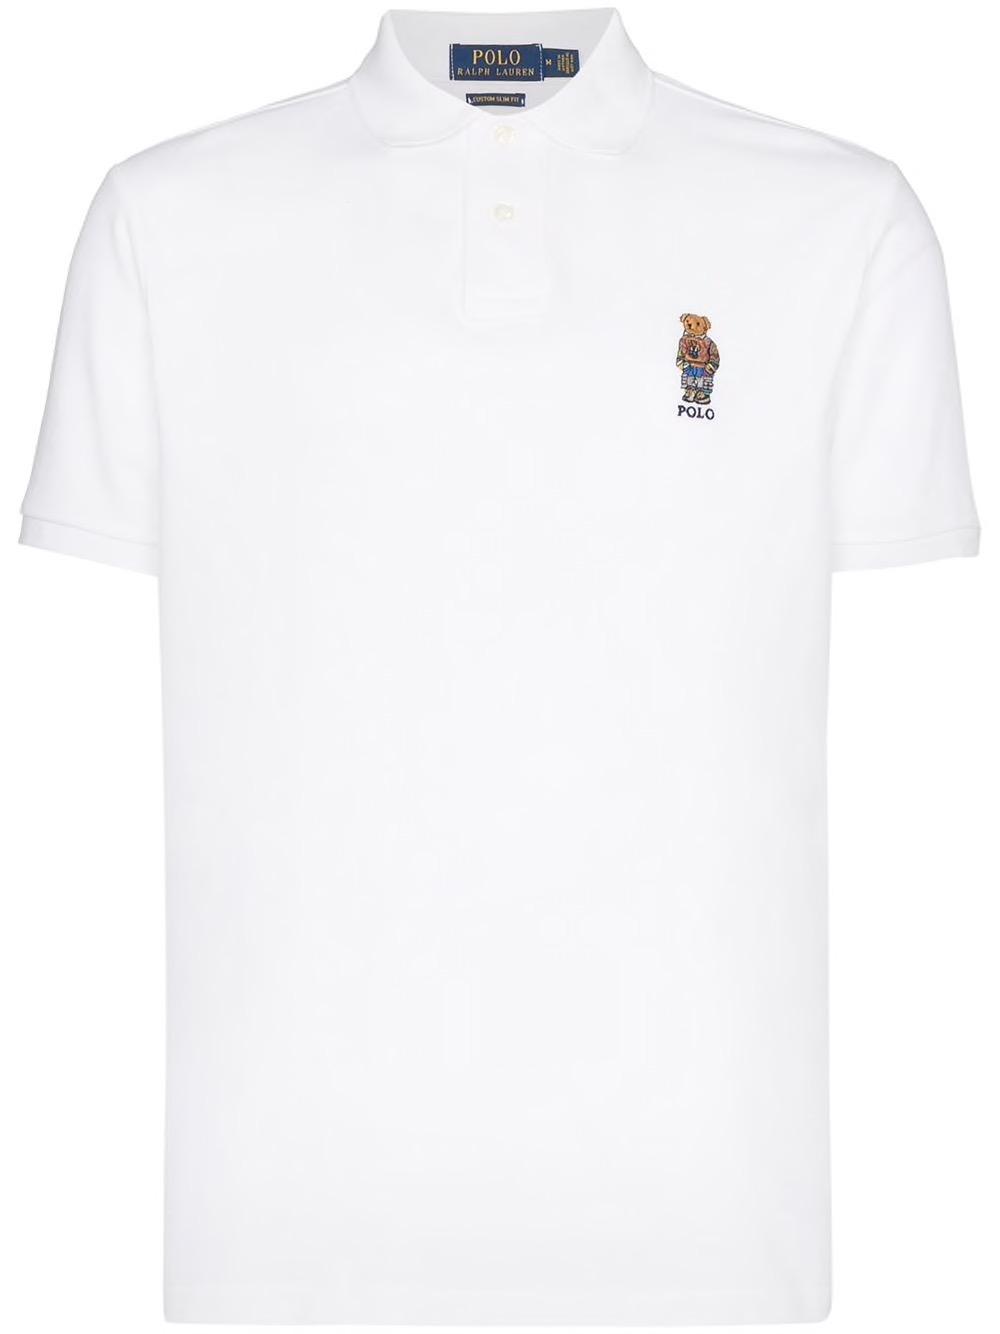 Teddy Bear White Polo Shirt